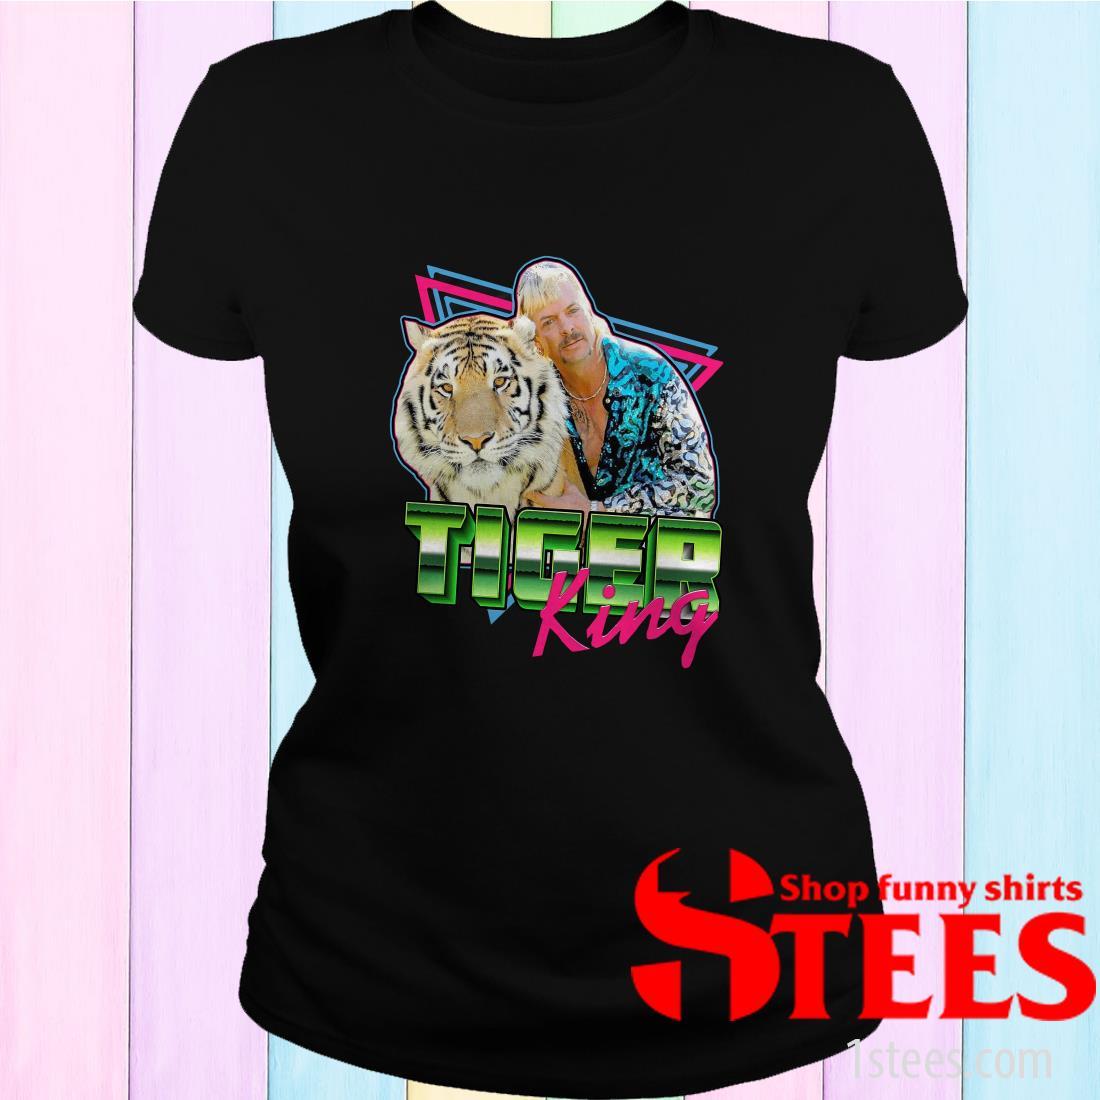 Joe Exotic Tiger King Tee Women's T-Shirt